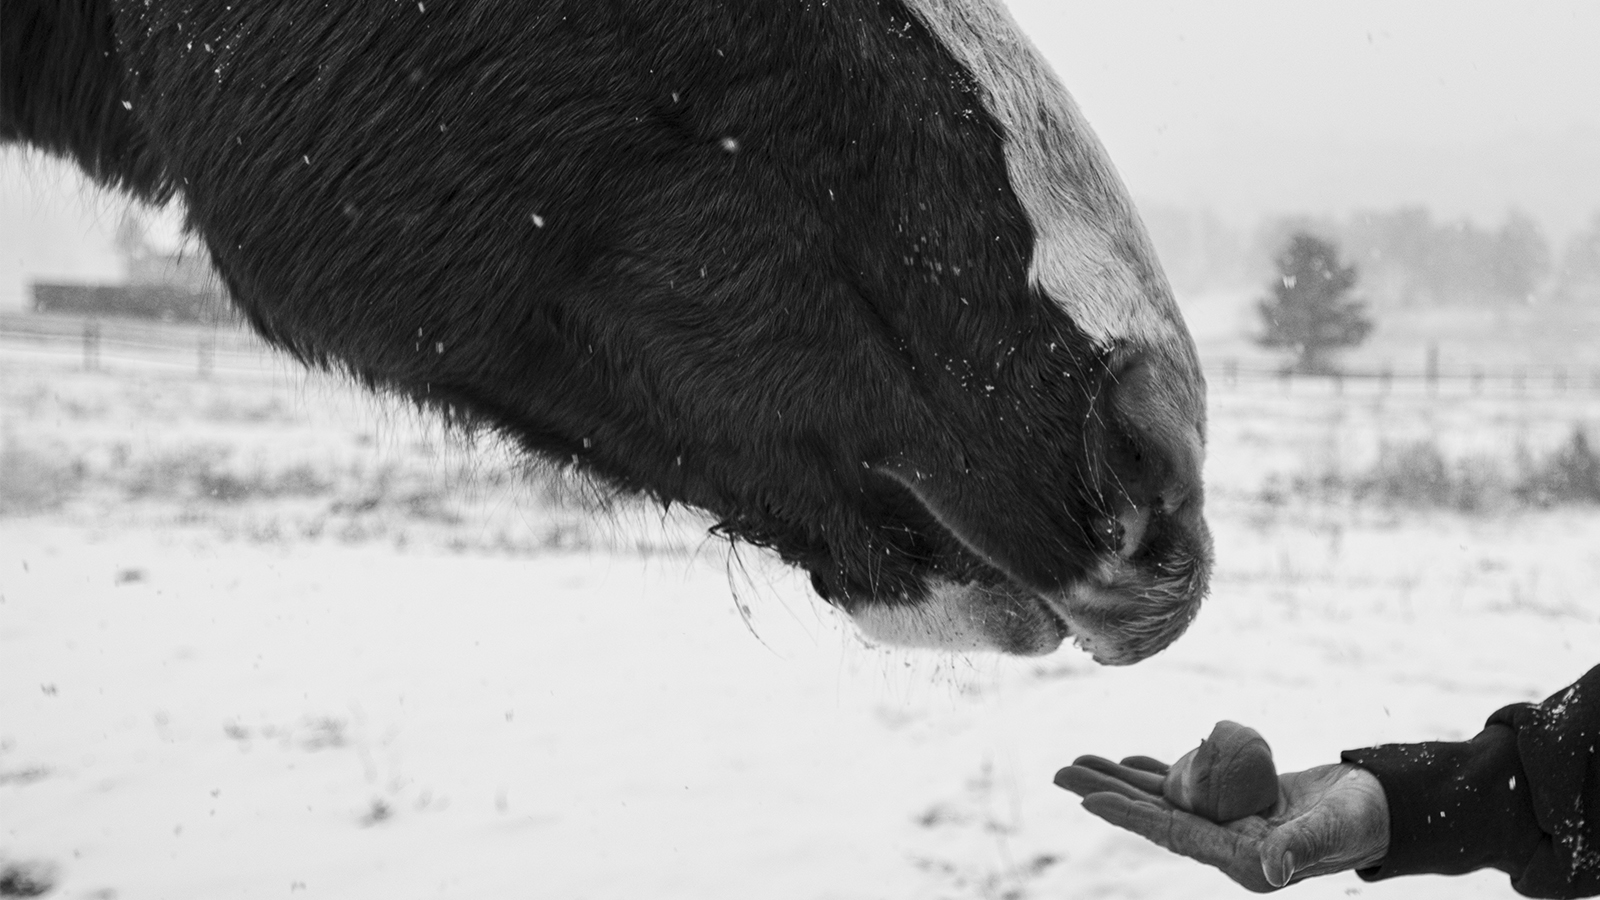 Feeding an apple to a horse